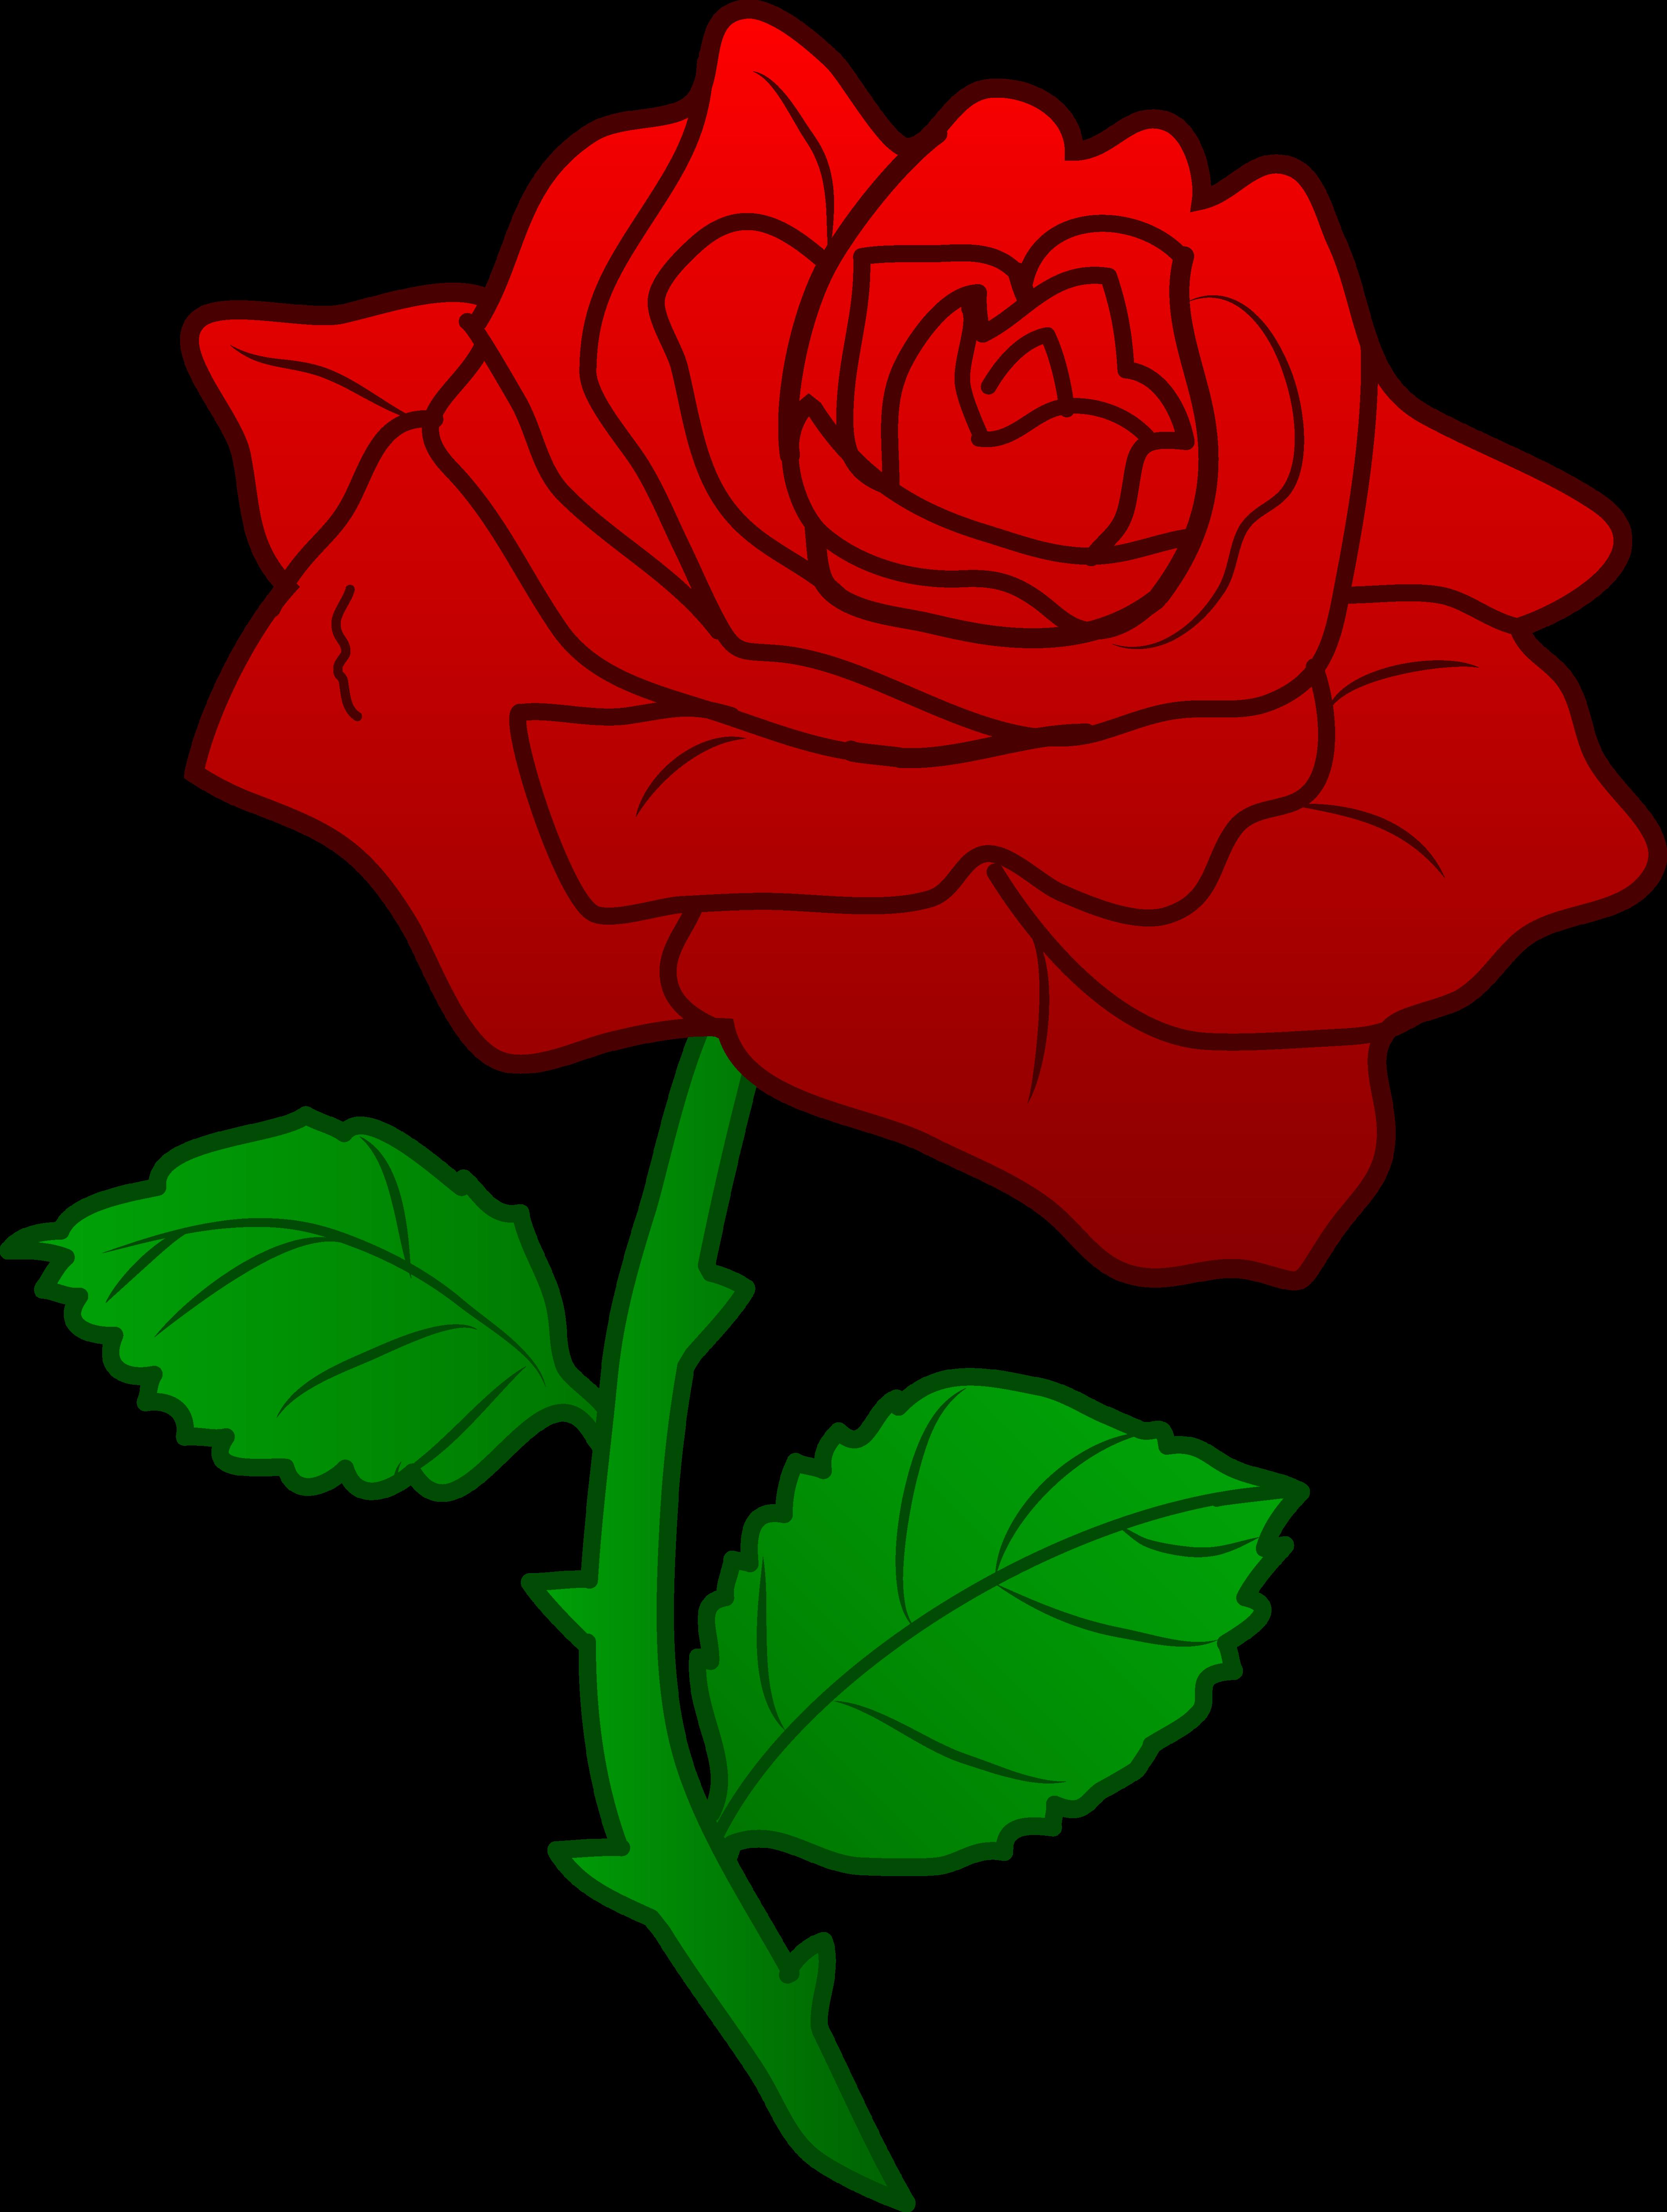 Rose Clipart & Rose Clip Art Images.